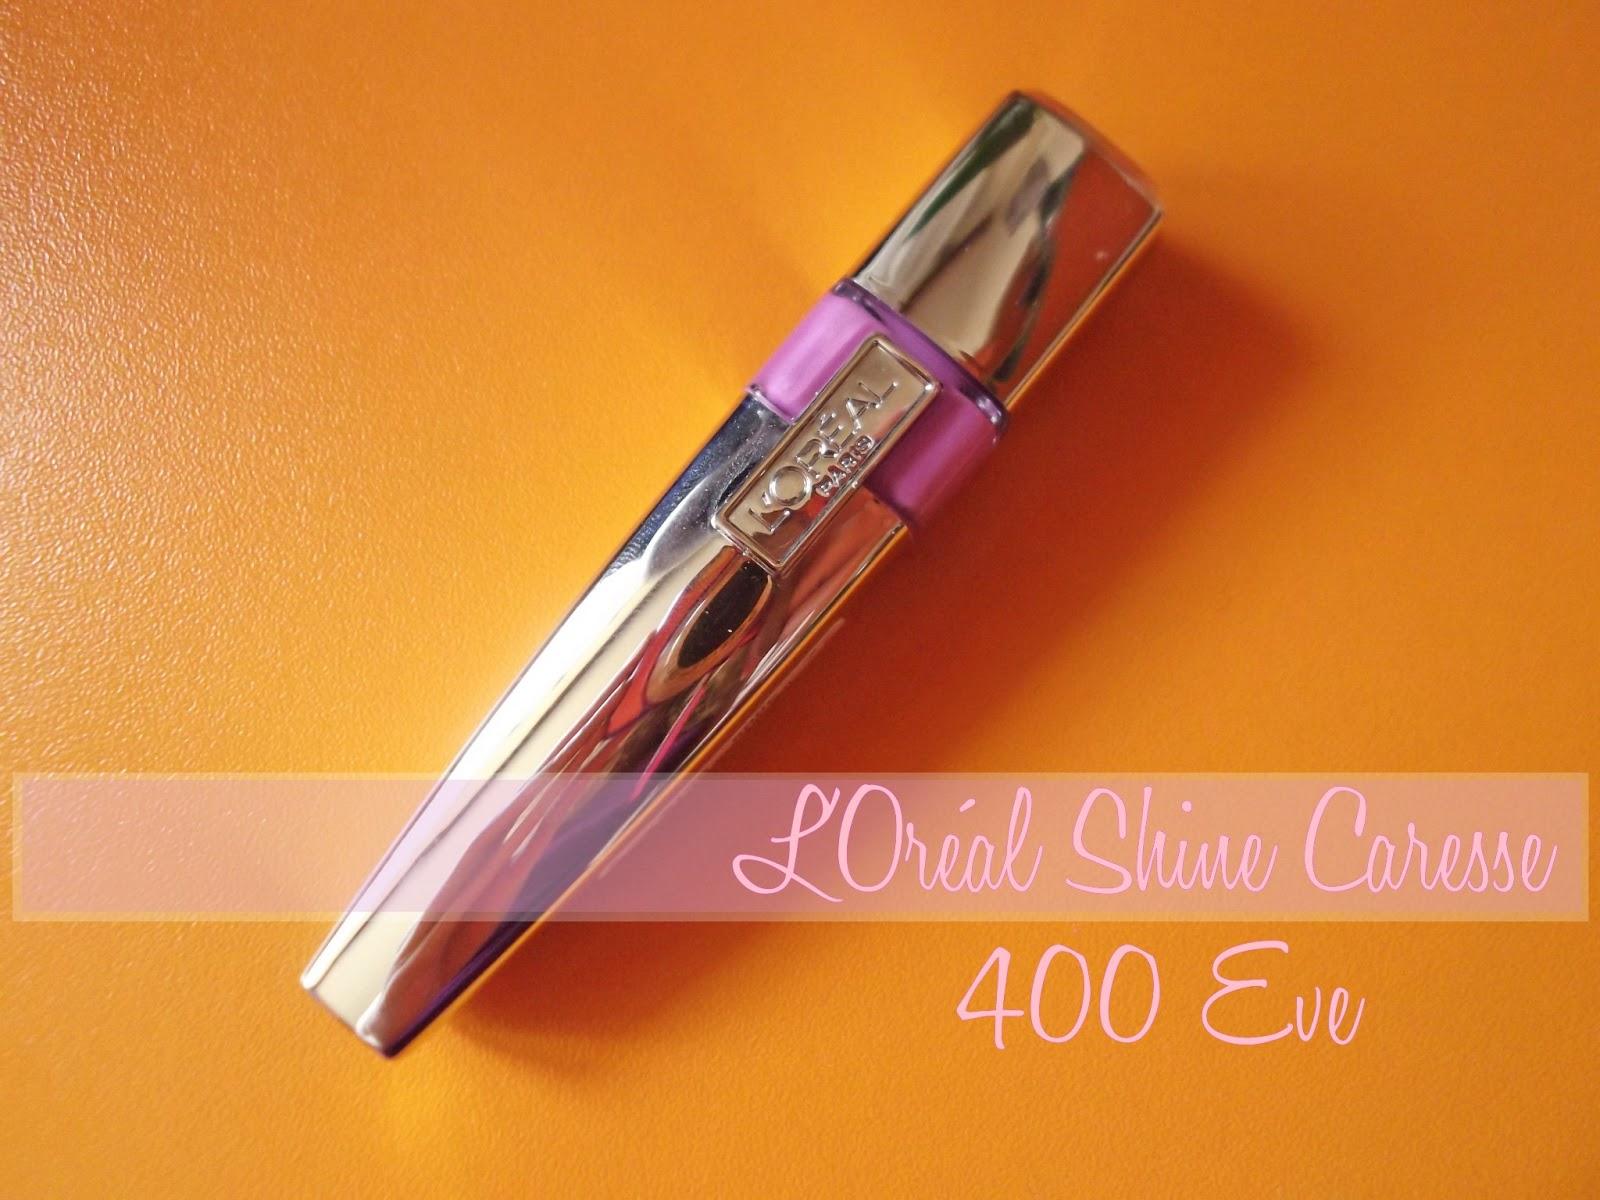 http://3.bp.blogspot.com/-AUrGZBosuPU/UXJHOP-jToI/AAAAAAAAJ-8/pGGFJSTNT4w/s1600/shine+caresse+review+swatch+400+eve.JPG